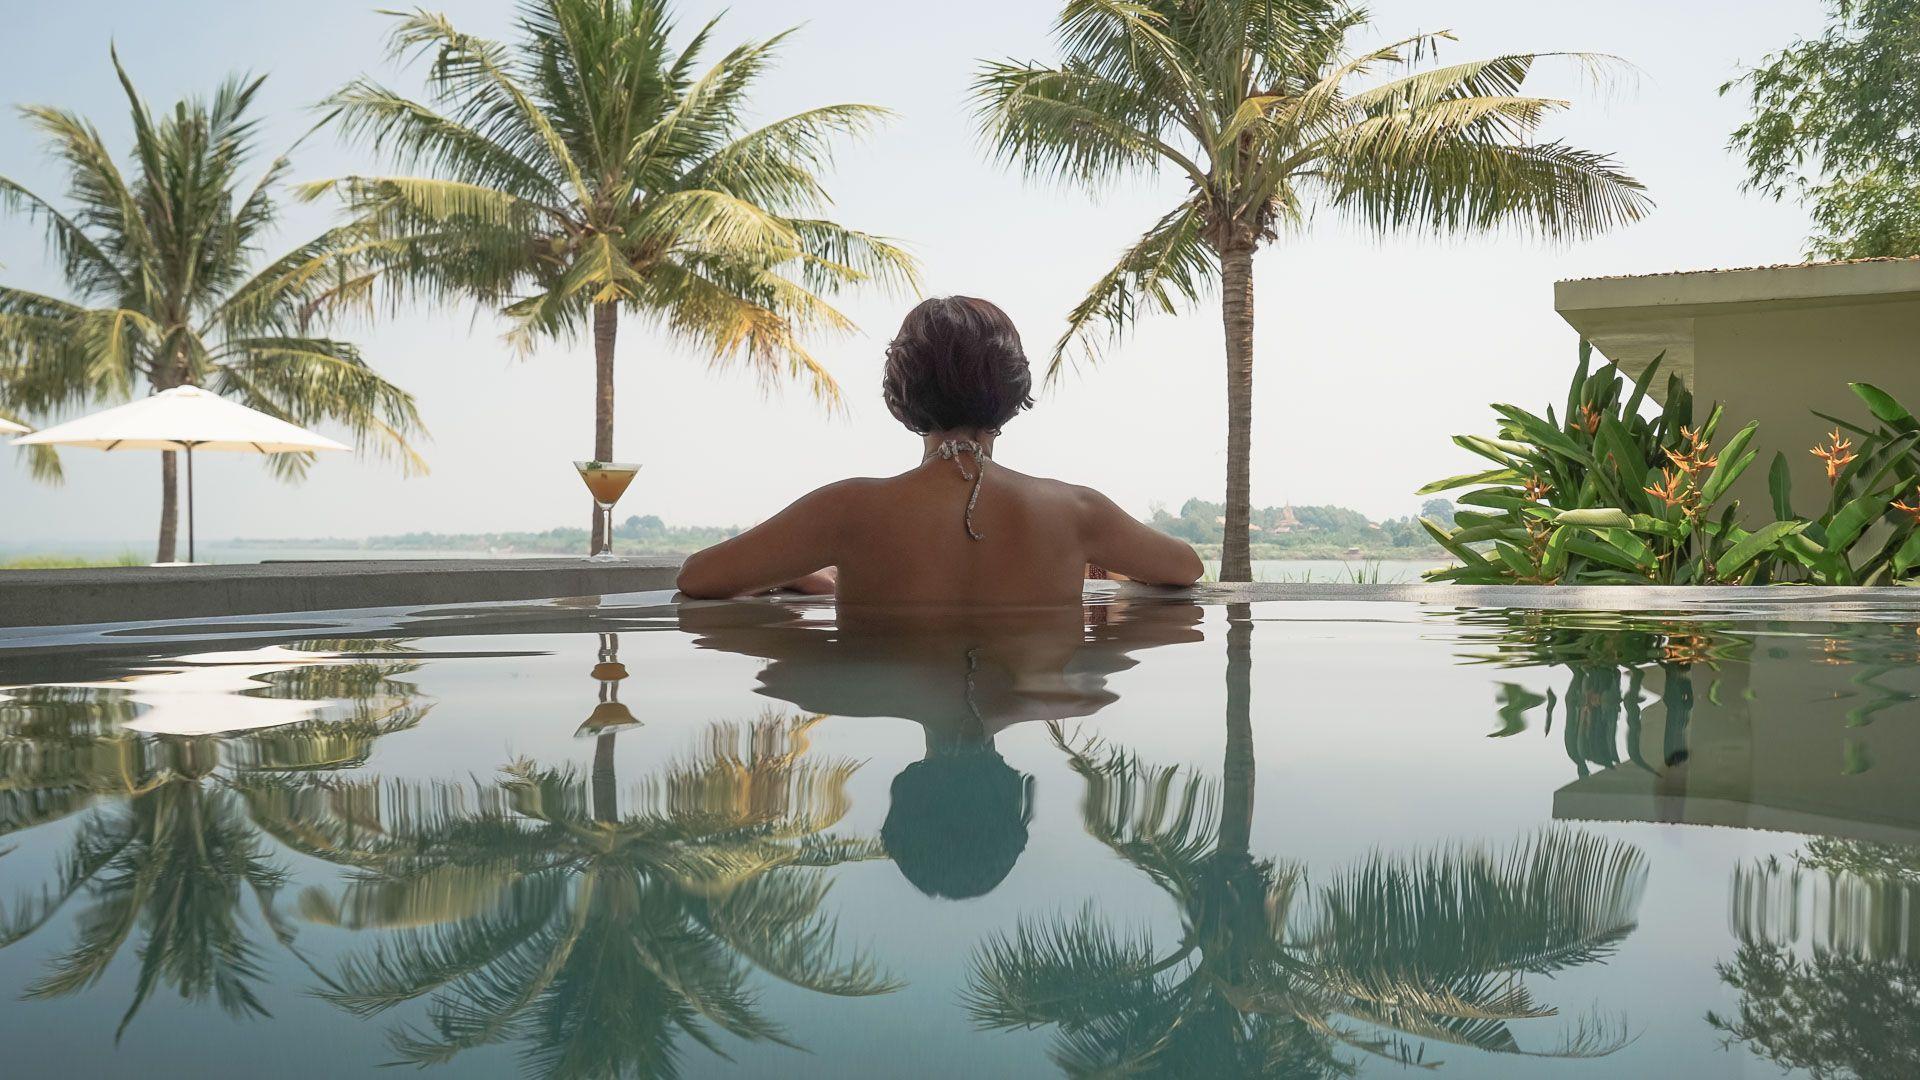 Lesvoyageuses-voyage-Phnom-Penh-cambodge-hotel-the-bale-experience-37